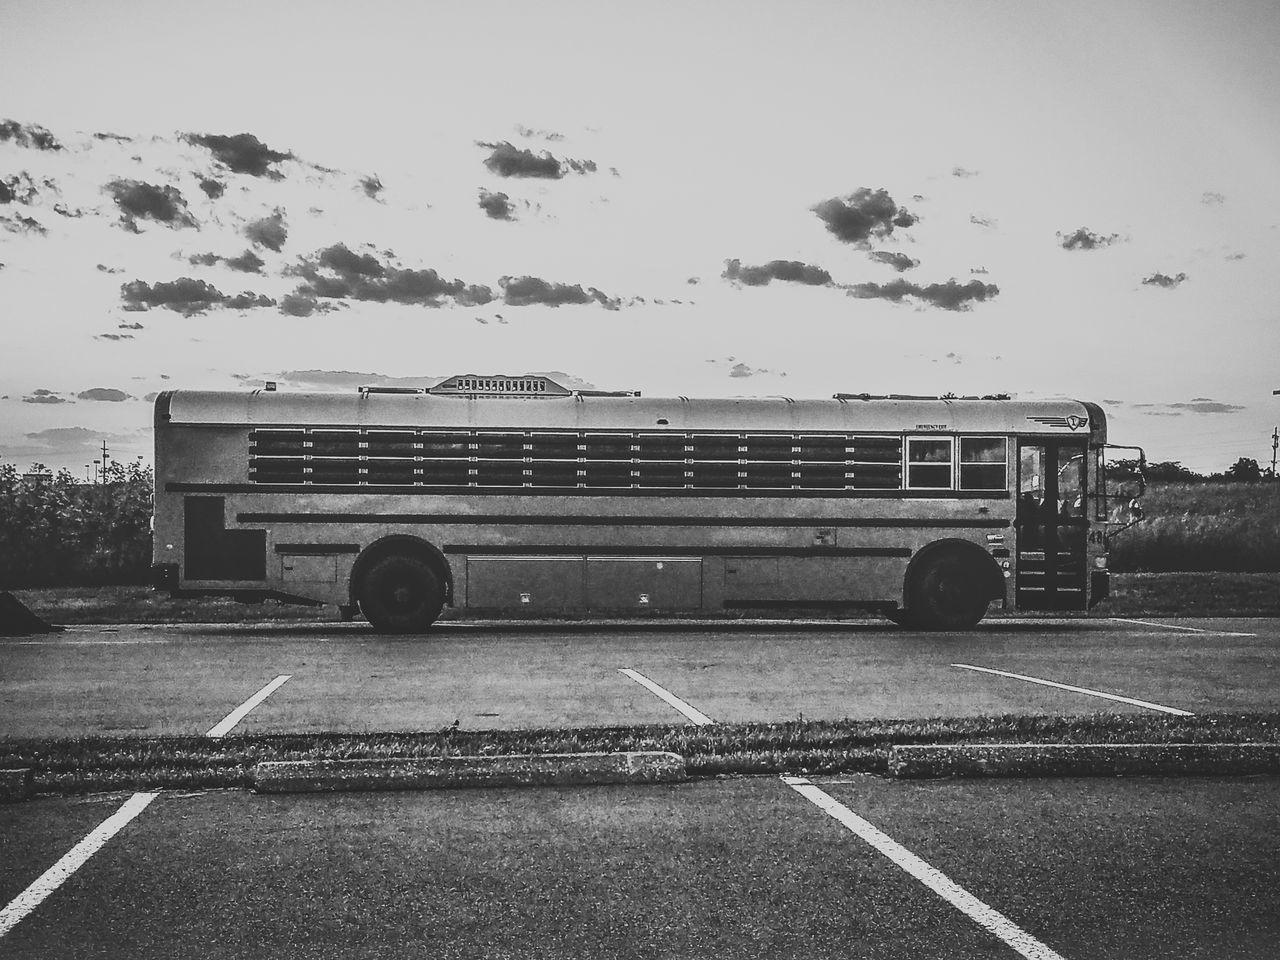 Bus Clouds Cloudy Sky Hub Mode Of Transport No Escape Parked Parking Lot Prison Bus Prison Hub Transportation What The Bus?